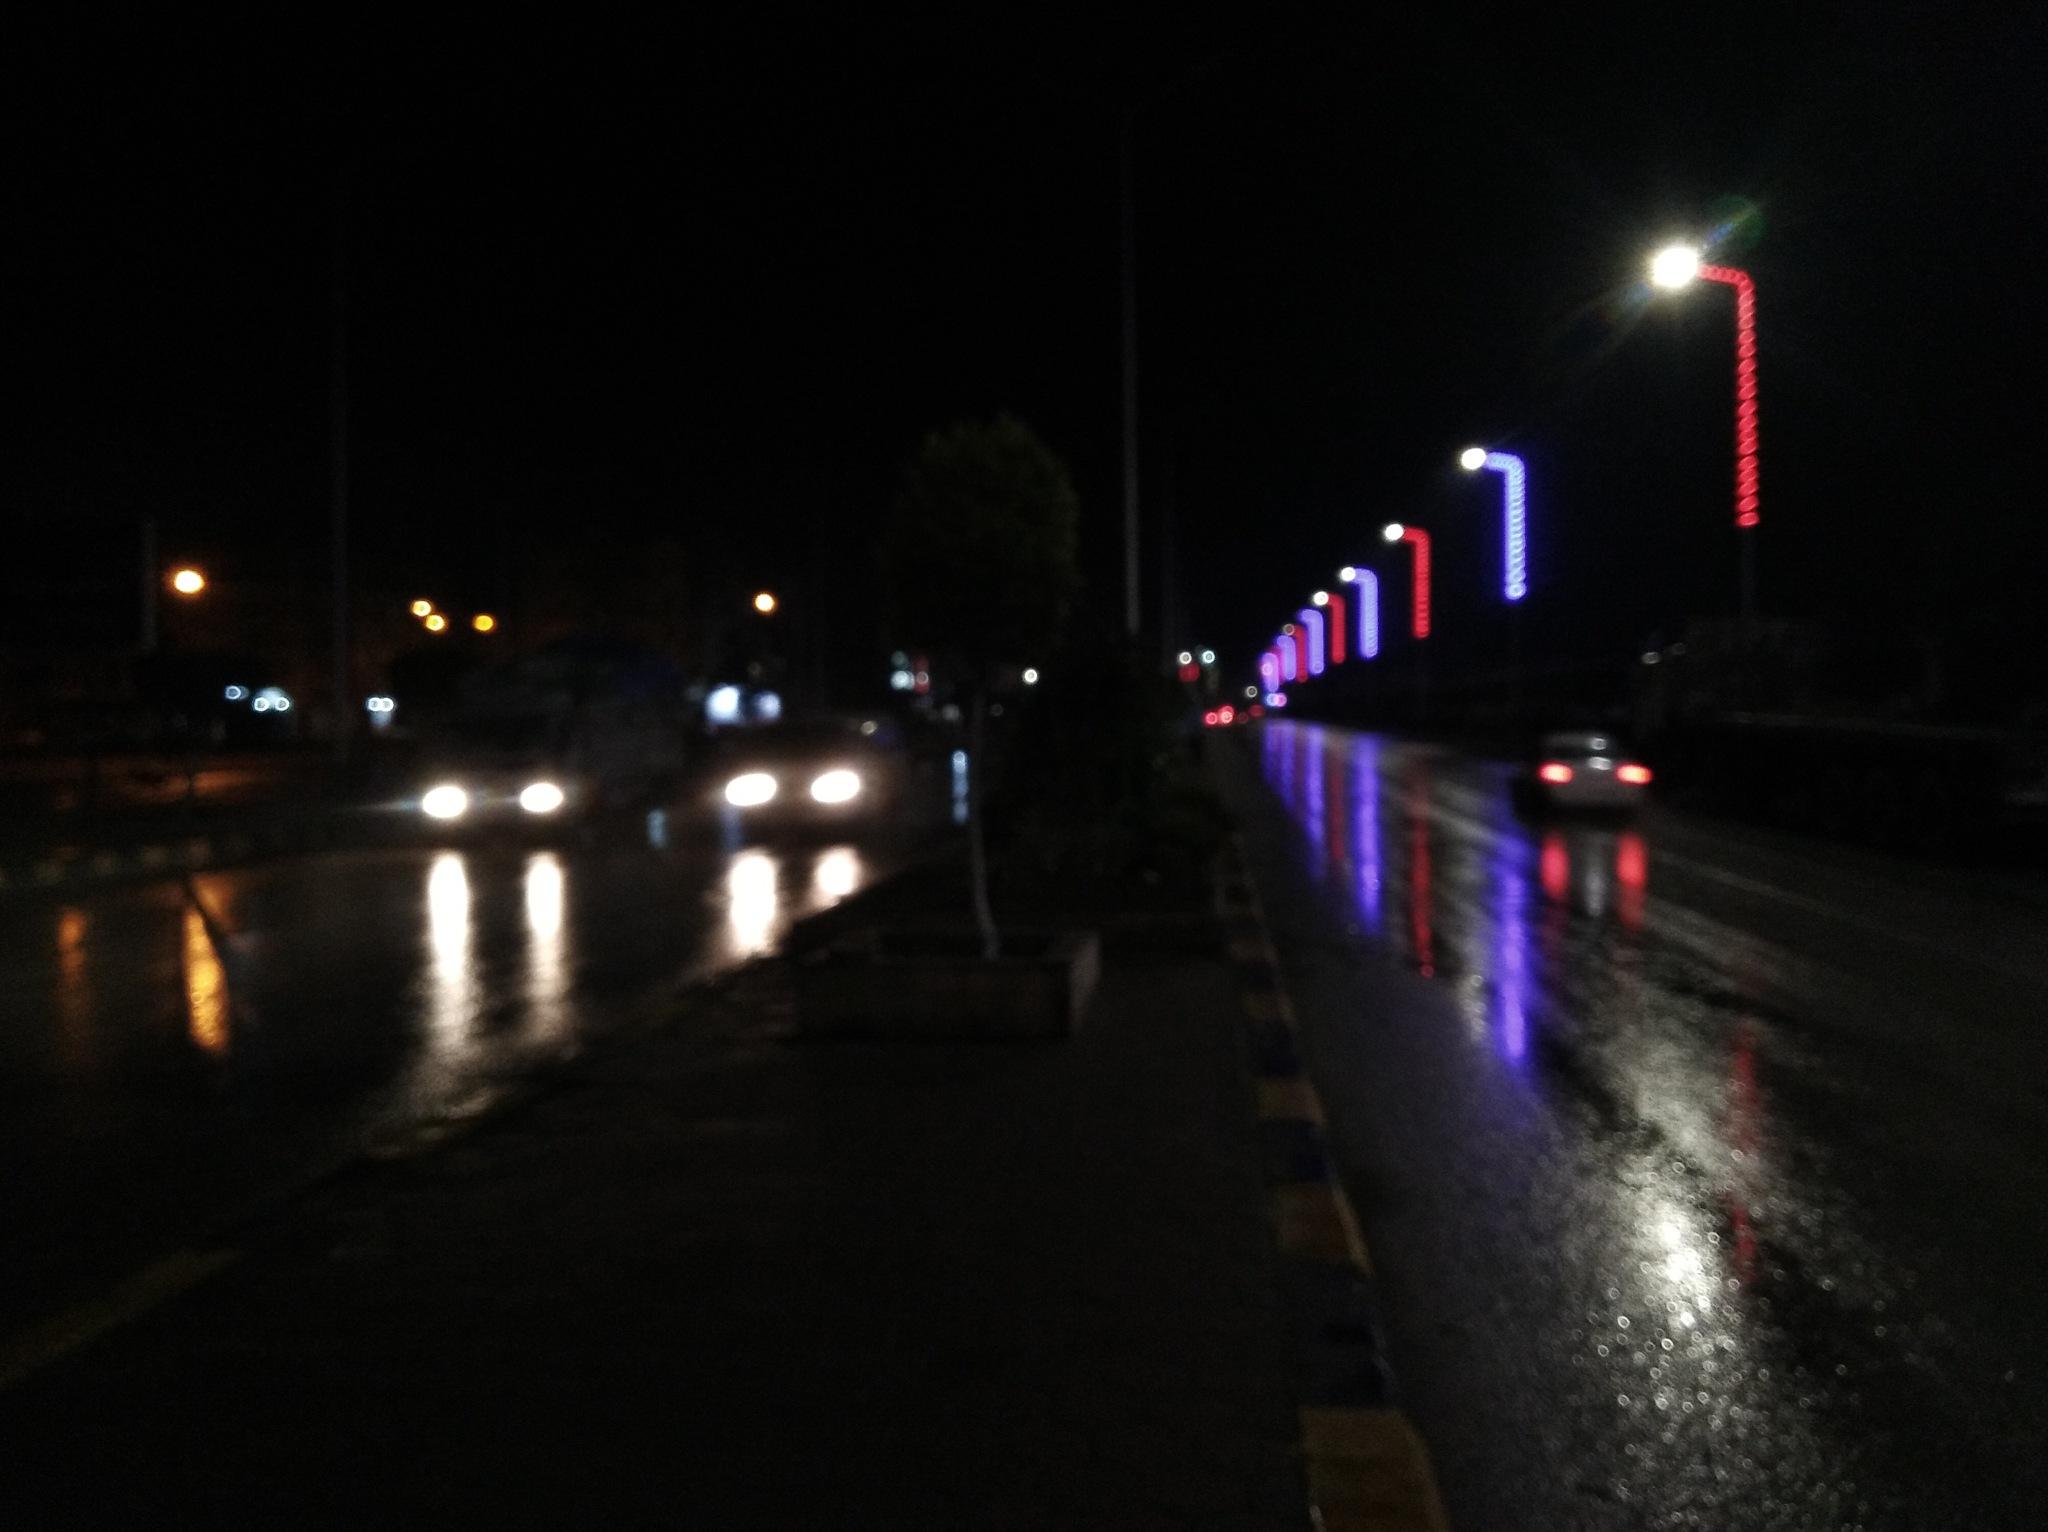 light by Khaled Elazhary